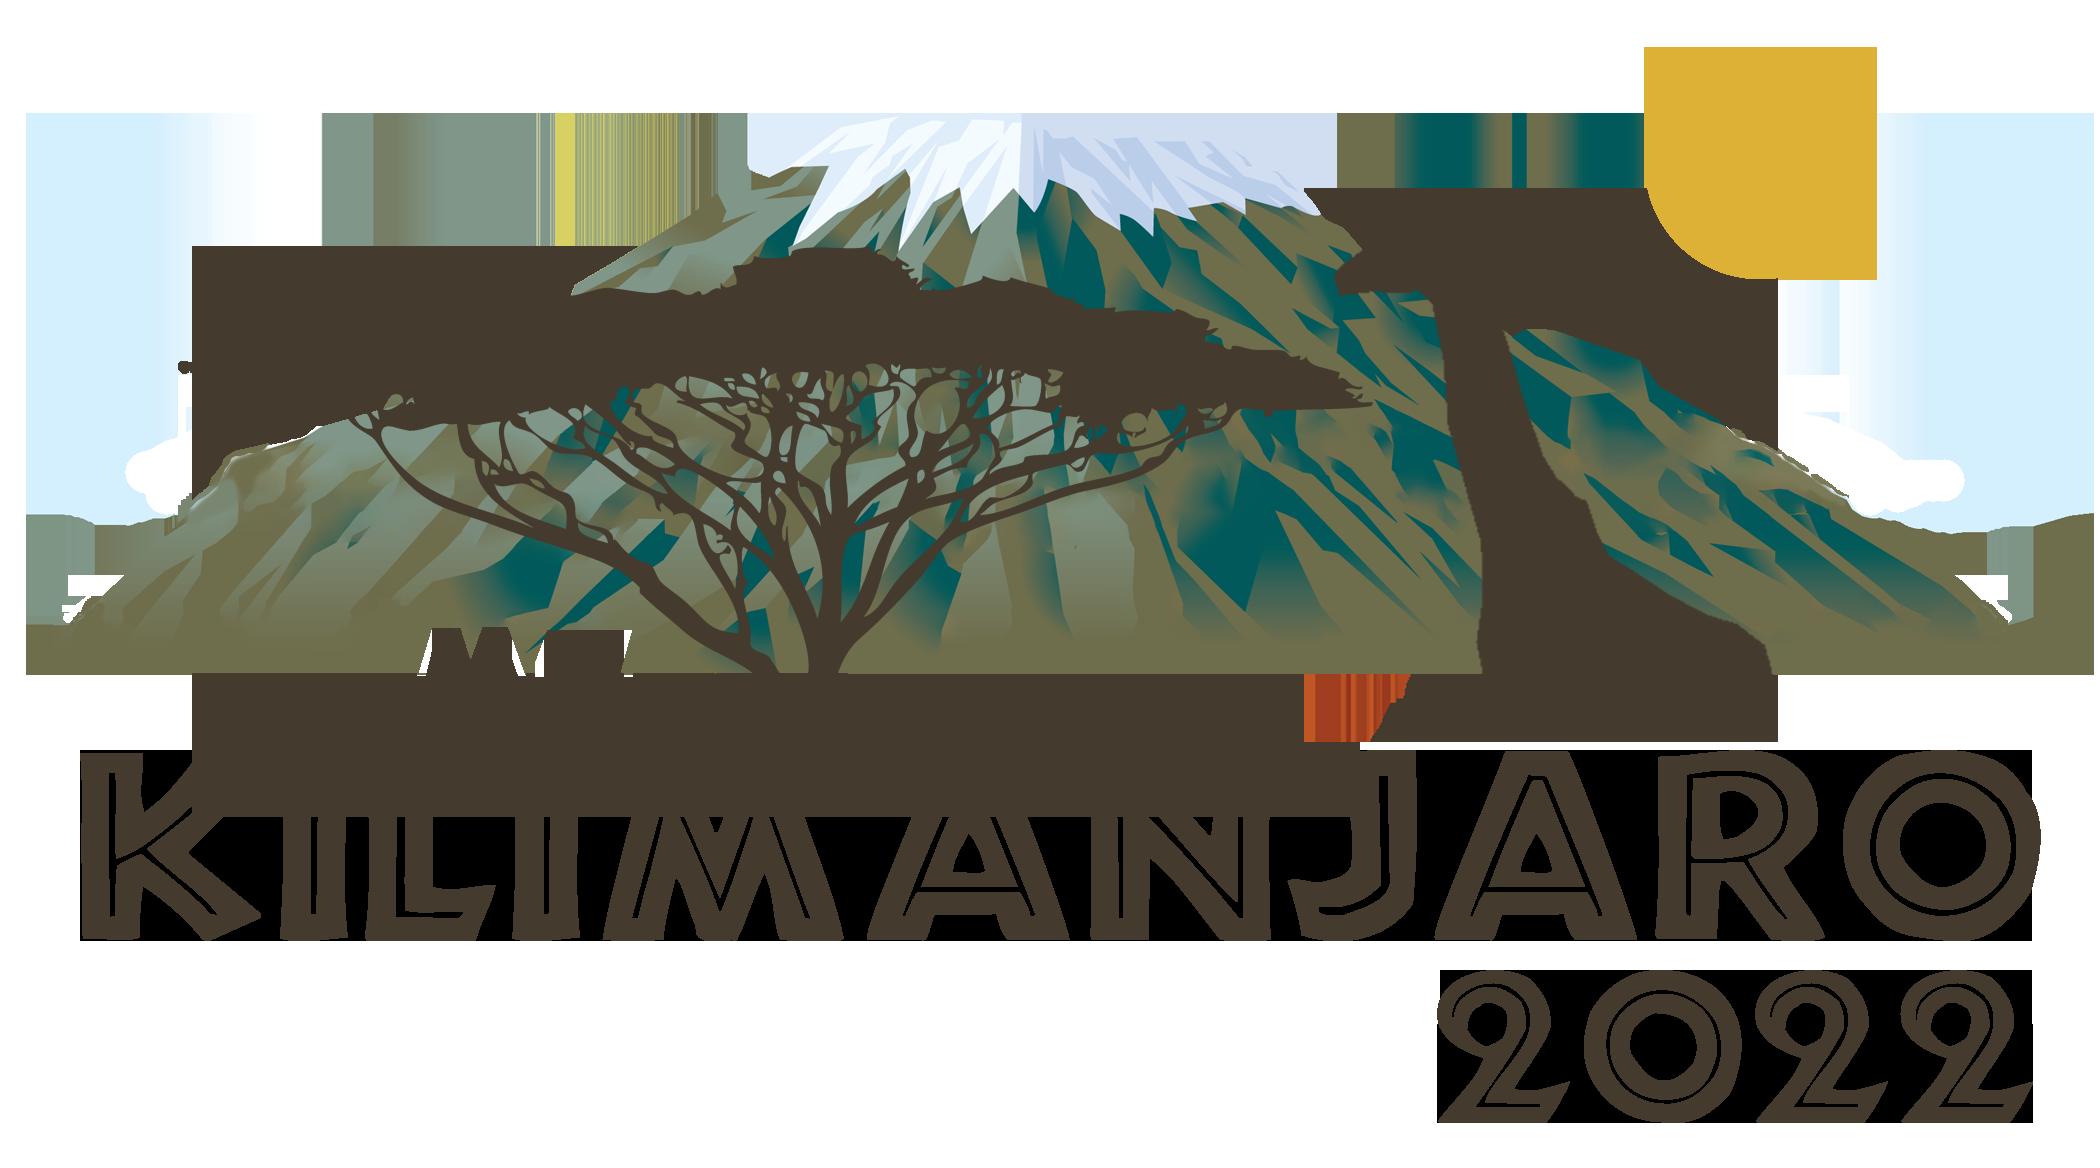 Kilimanjaro Expedition 2022